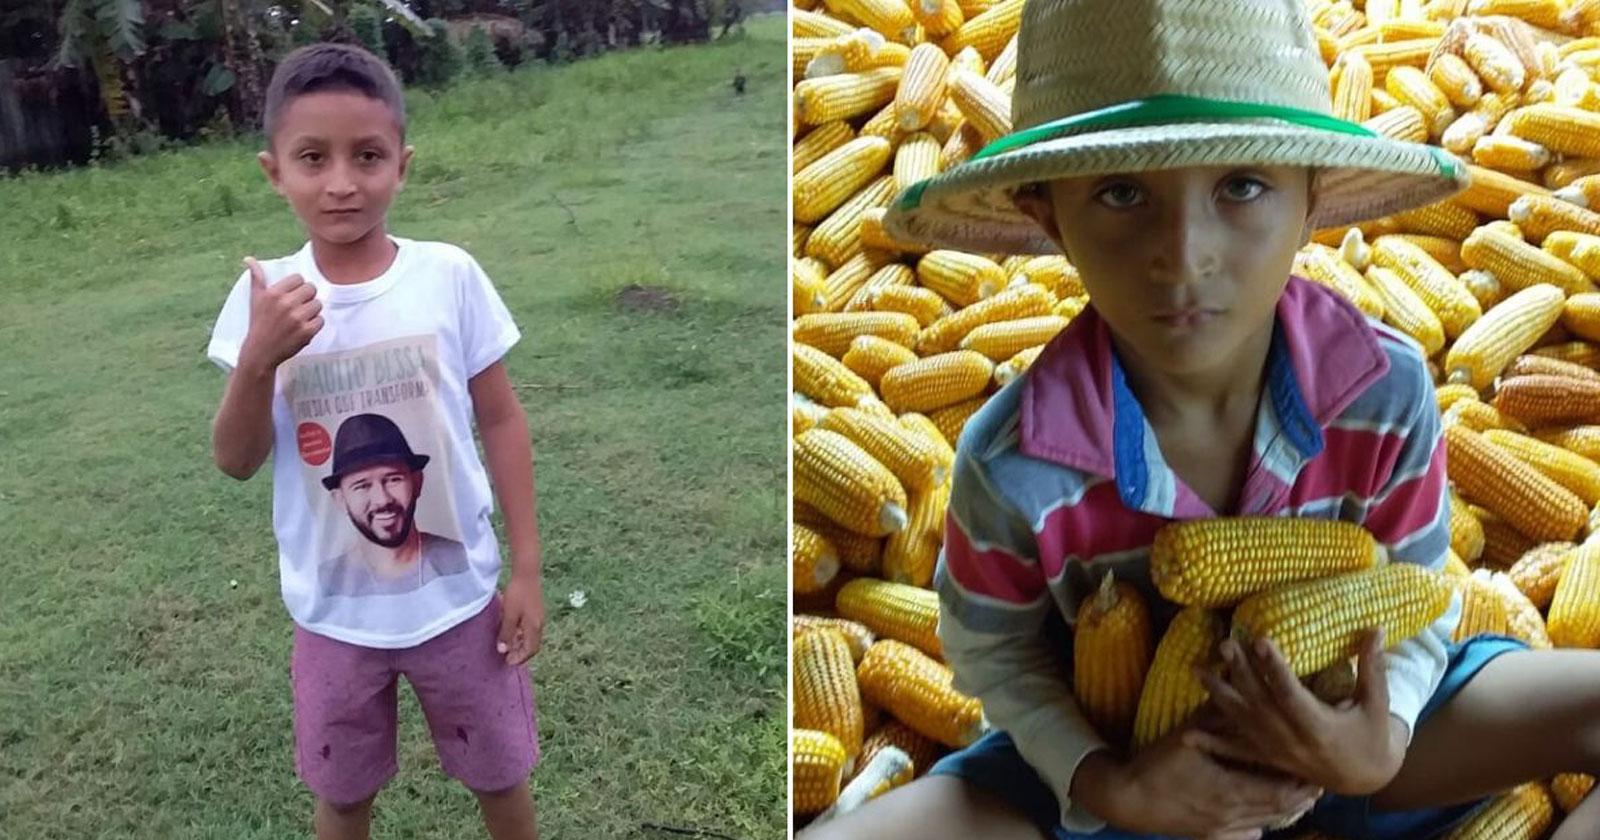 menino vestindo camiseta poeta bráulio bessa